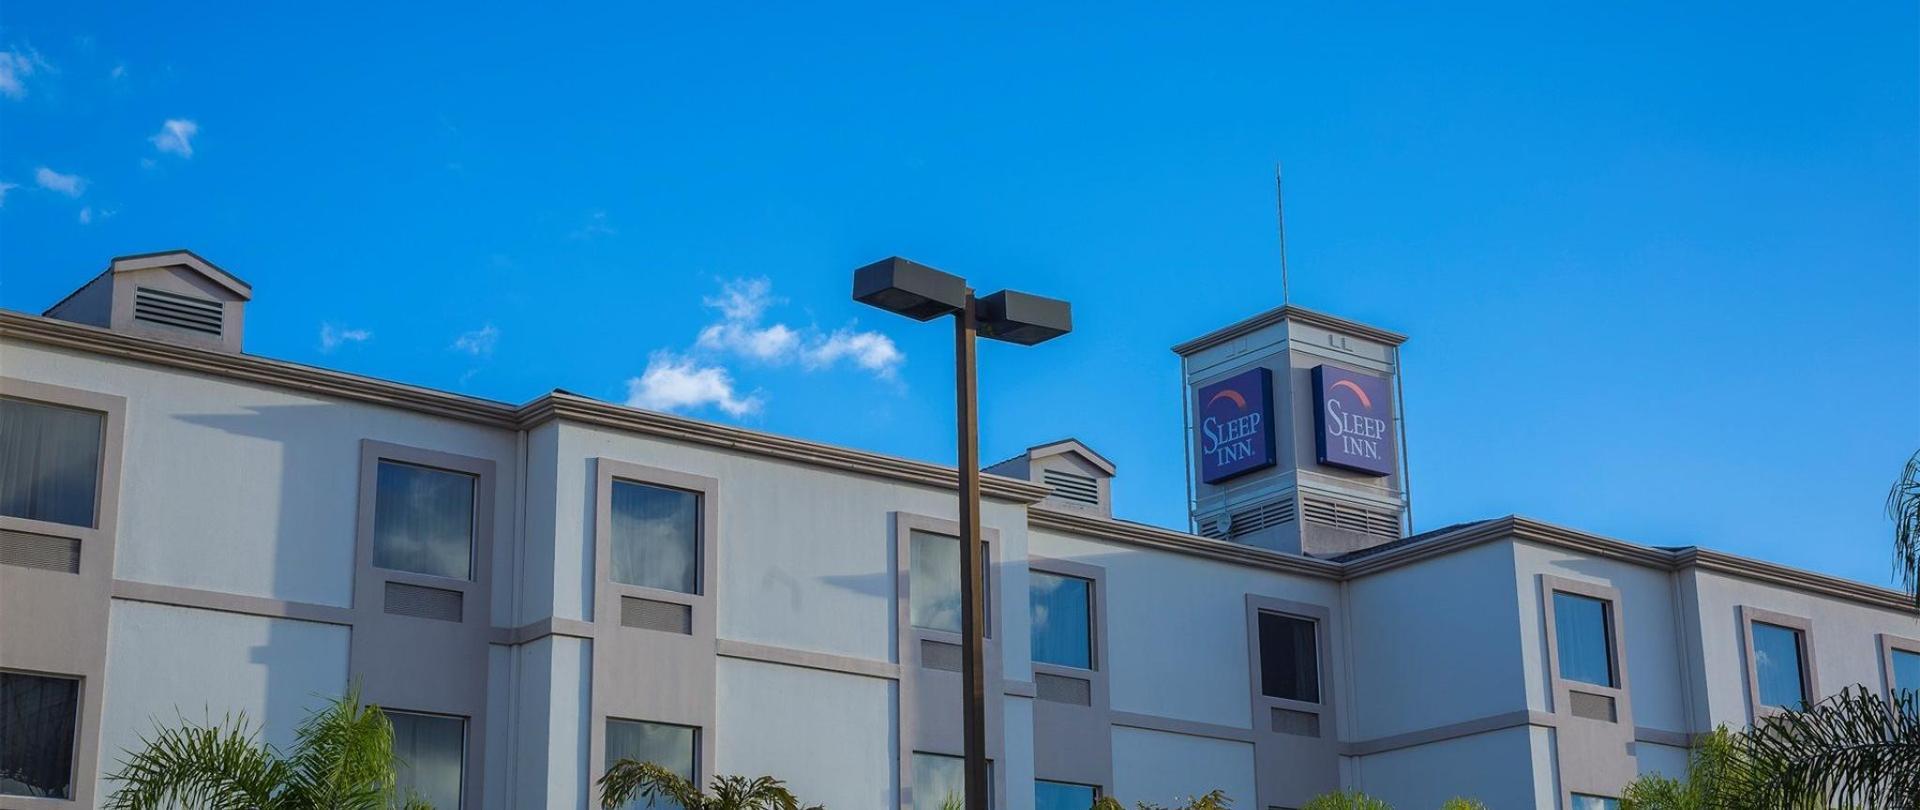 Sleep Inn Hotel Paseo Las Damas2.jpg